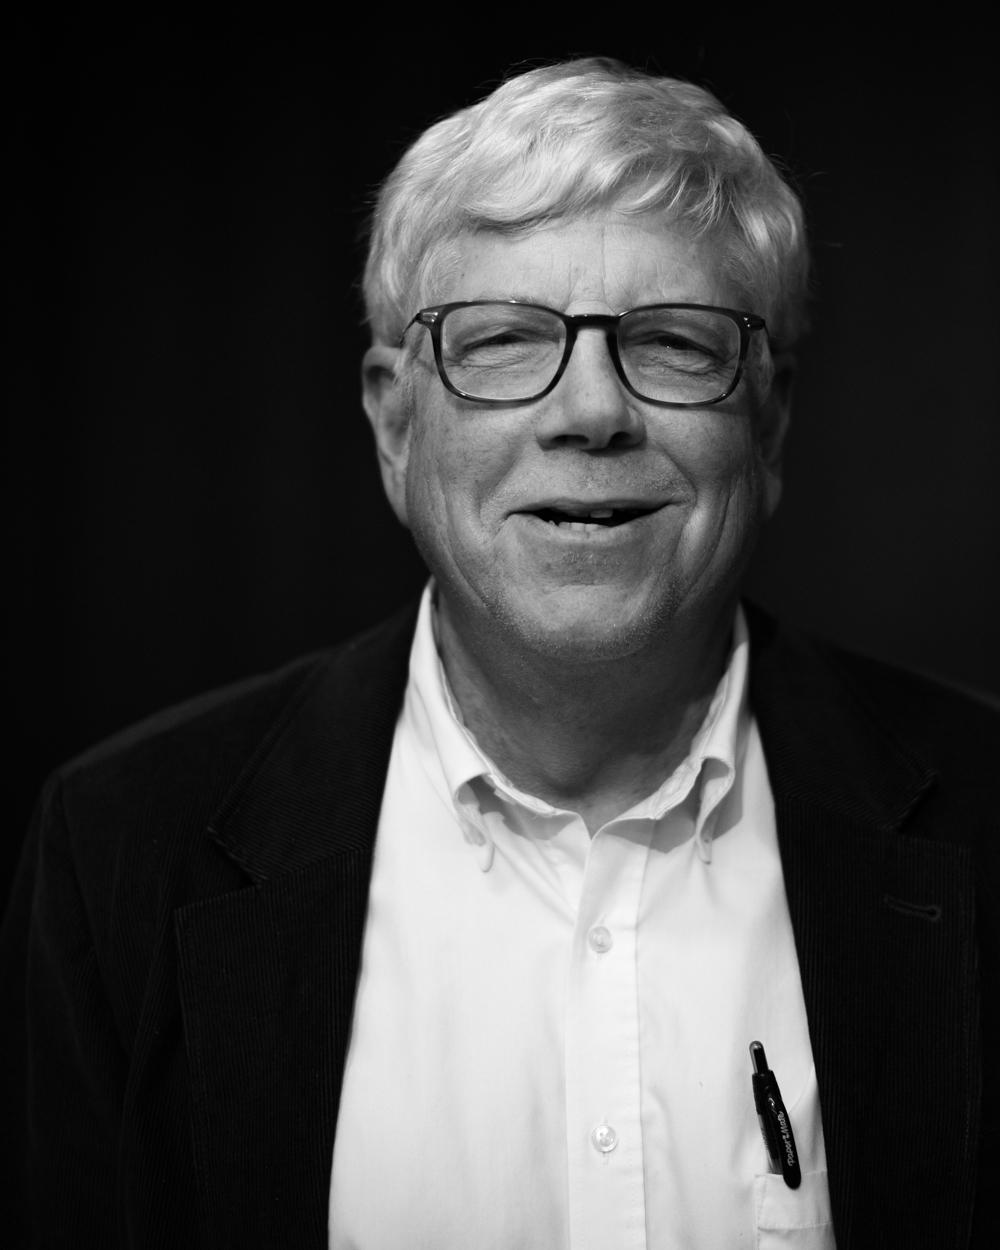 Allen Wells,Roger Howell, Jr. Professor of History at Bowdoin College.